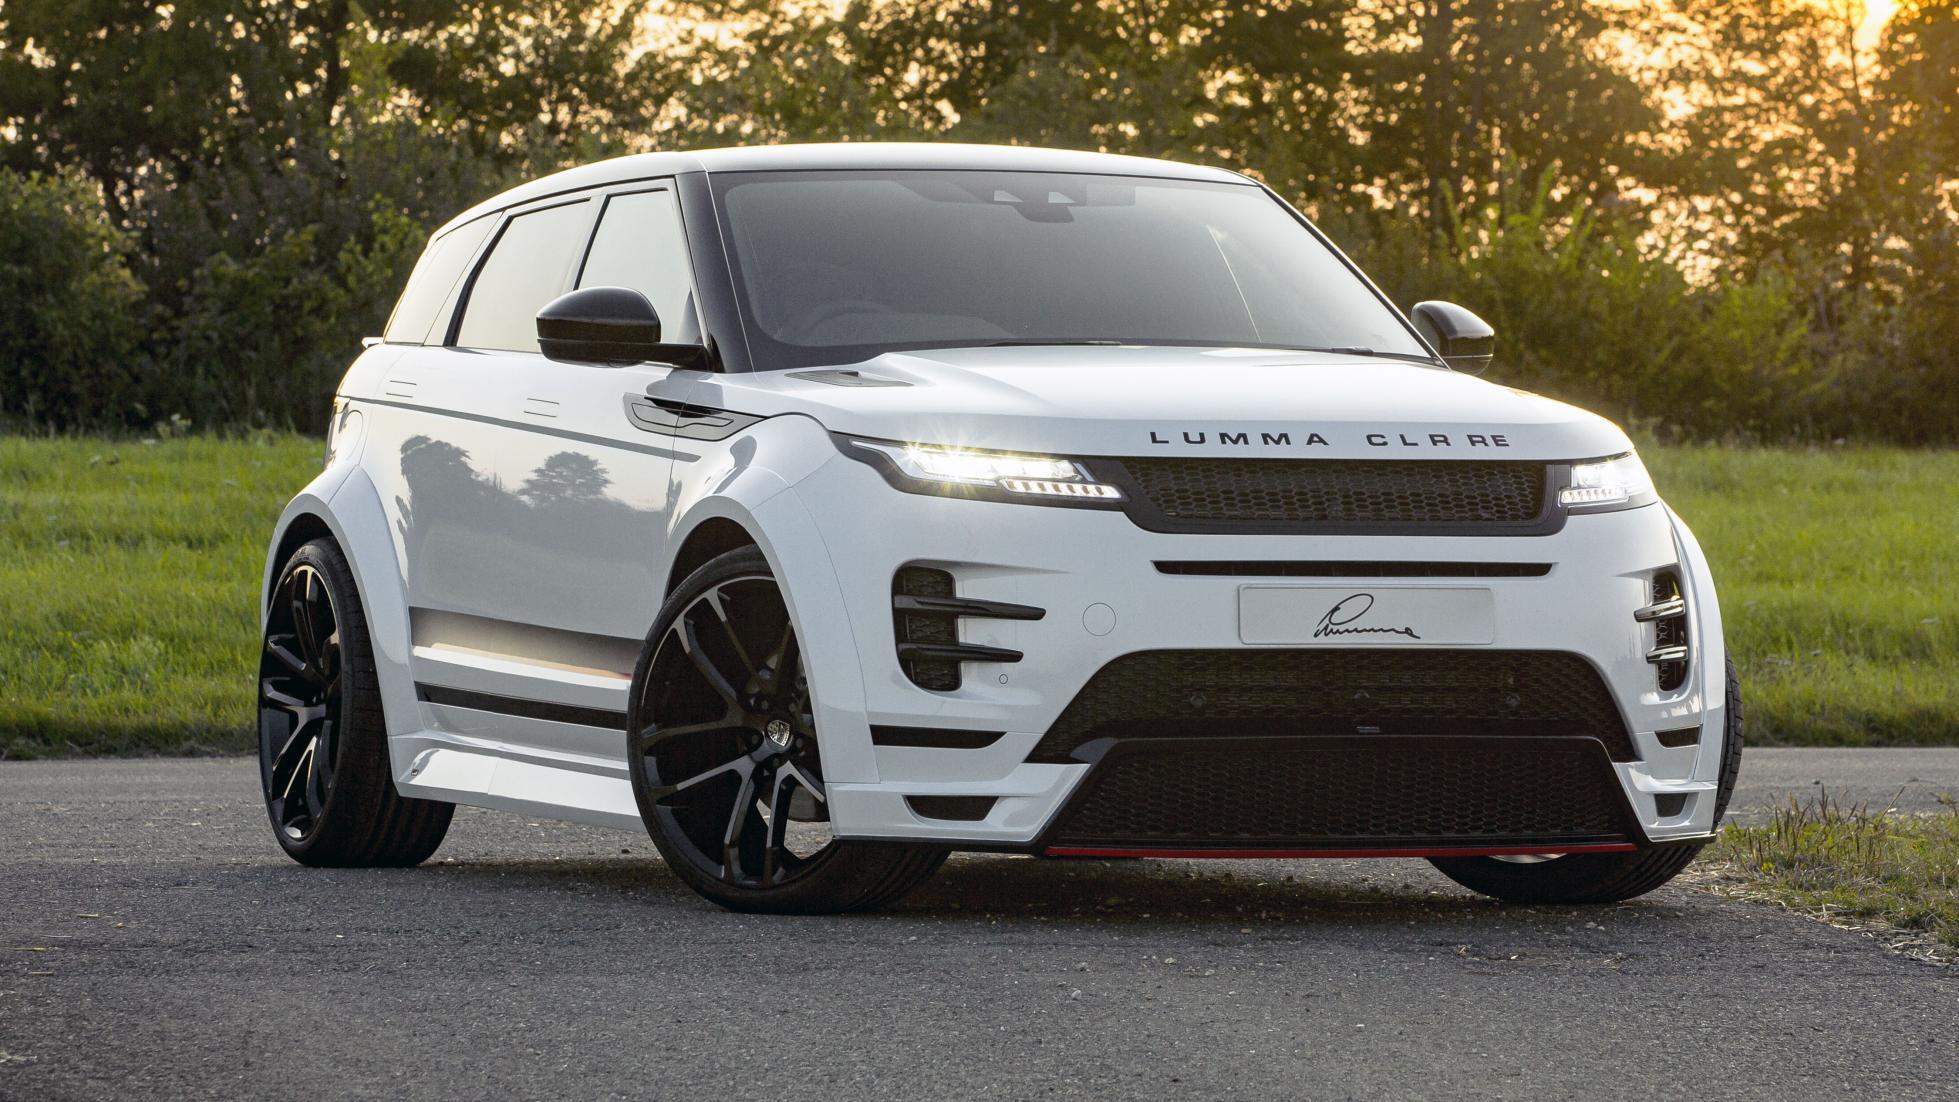 Range-Rover-Evoque-by-Lumma-Design-1